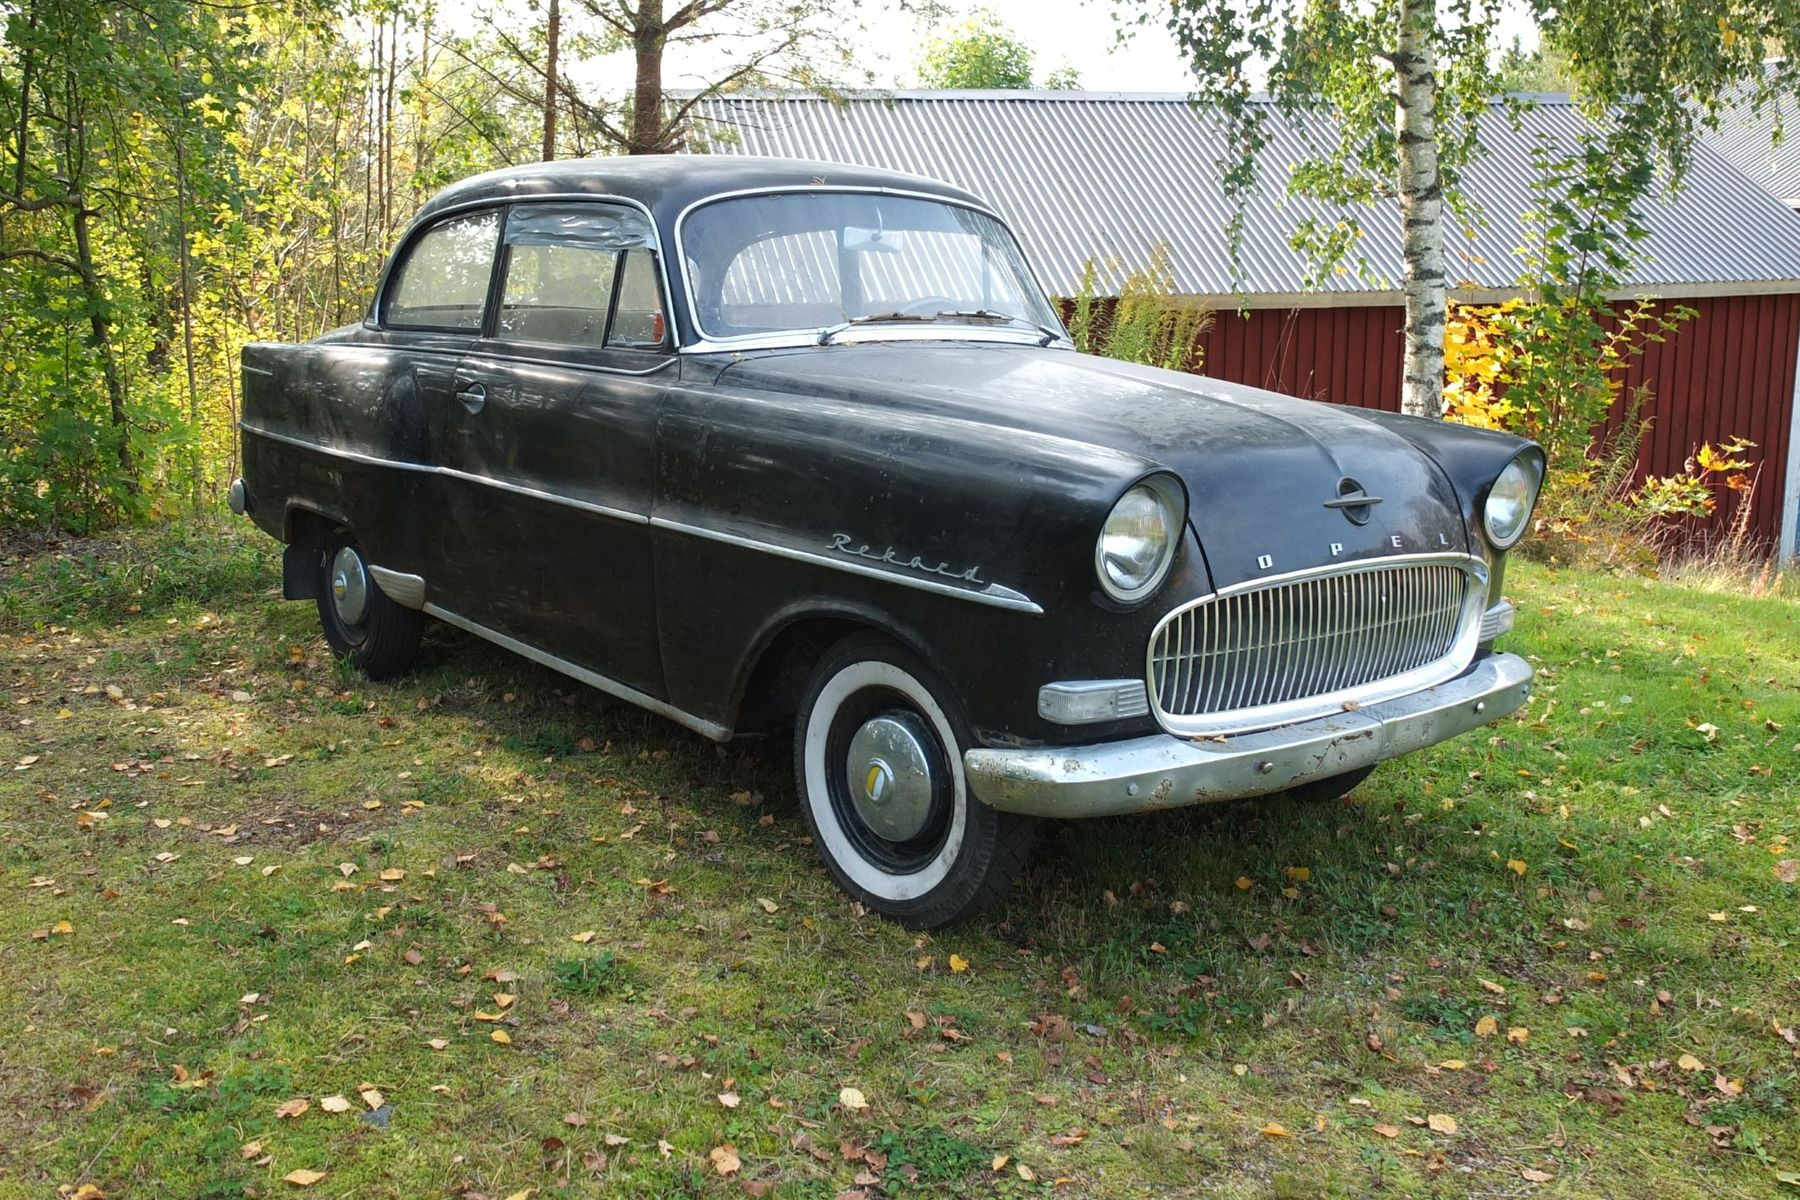 opel olympia rekord — 1957 on bilweb auctions